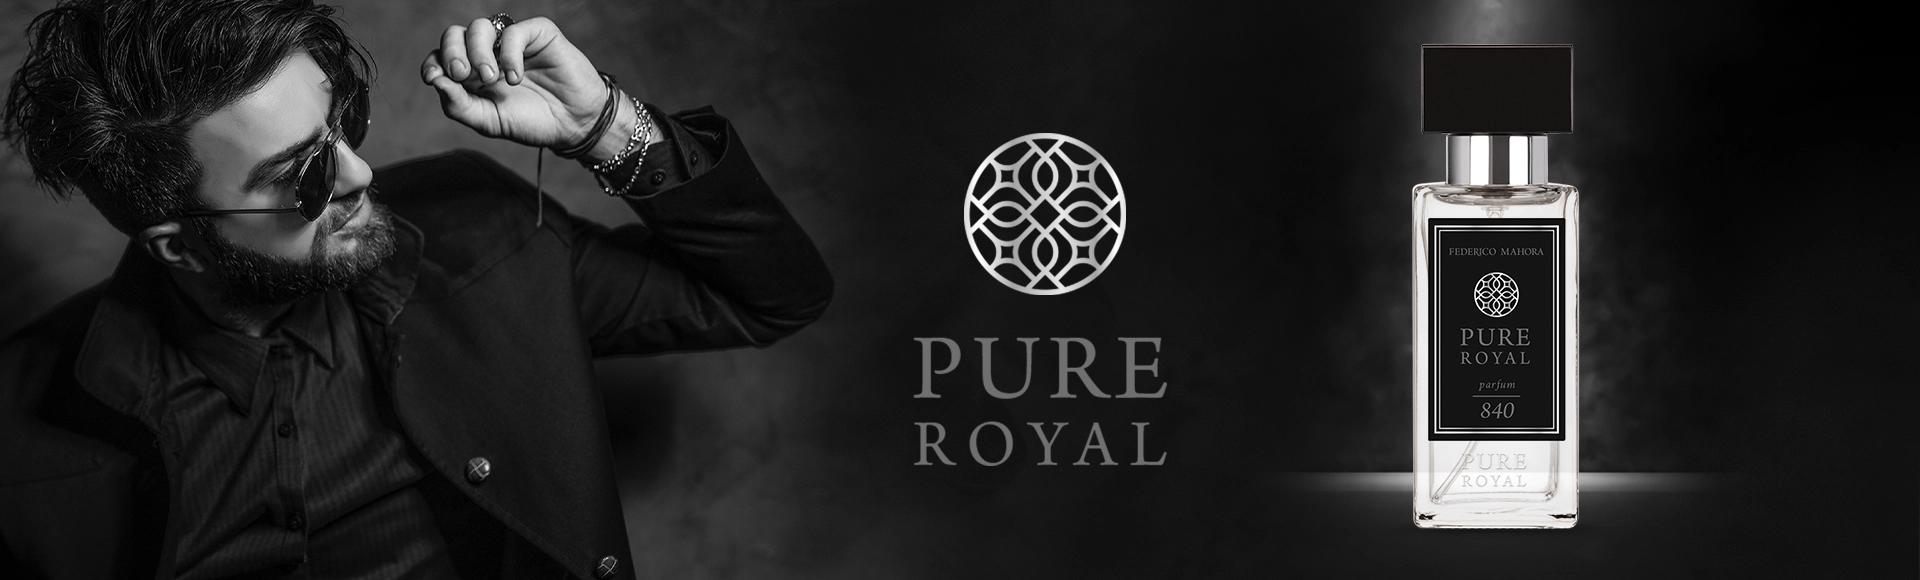 PURE-ROYAL-MANN